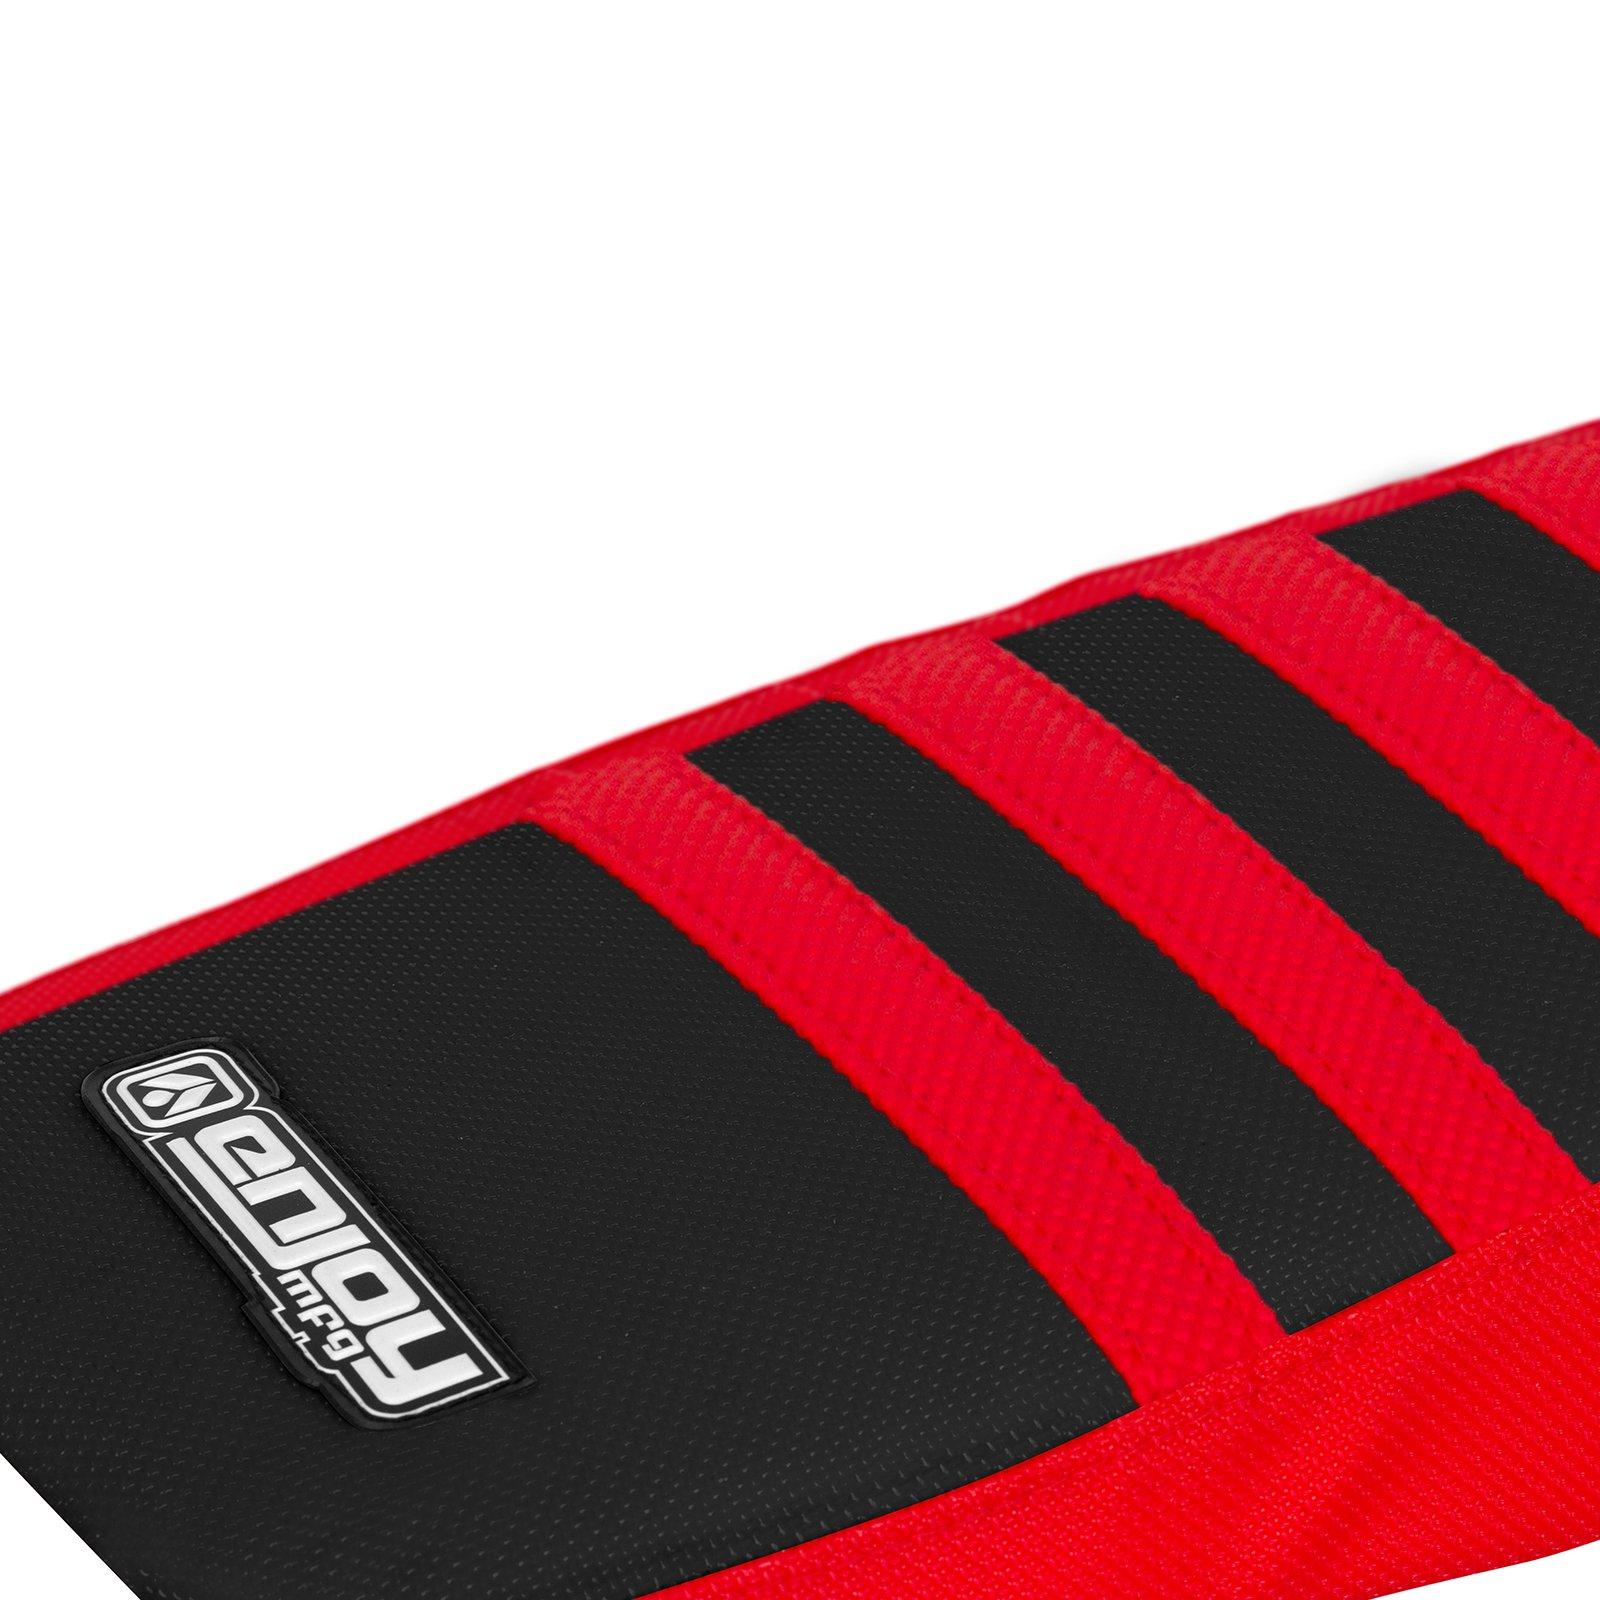 Enjoy MFG 2013 - 2015 Honda CRF 250 L Red Sides / Black Top / Red Ribs Seat Cover by Enjoy MFG (Image #2)